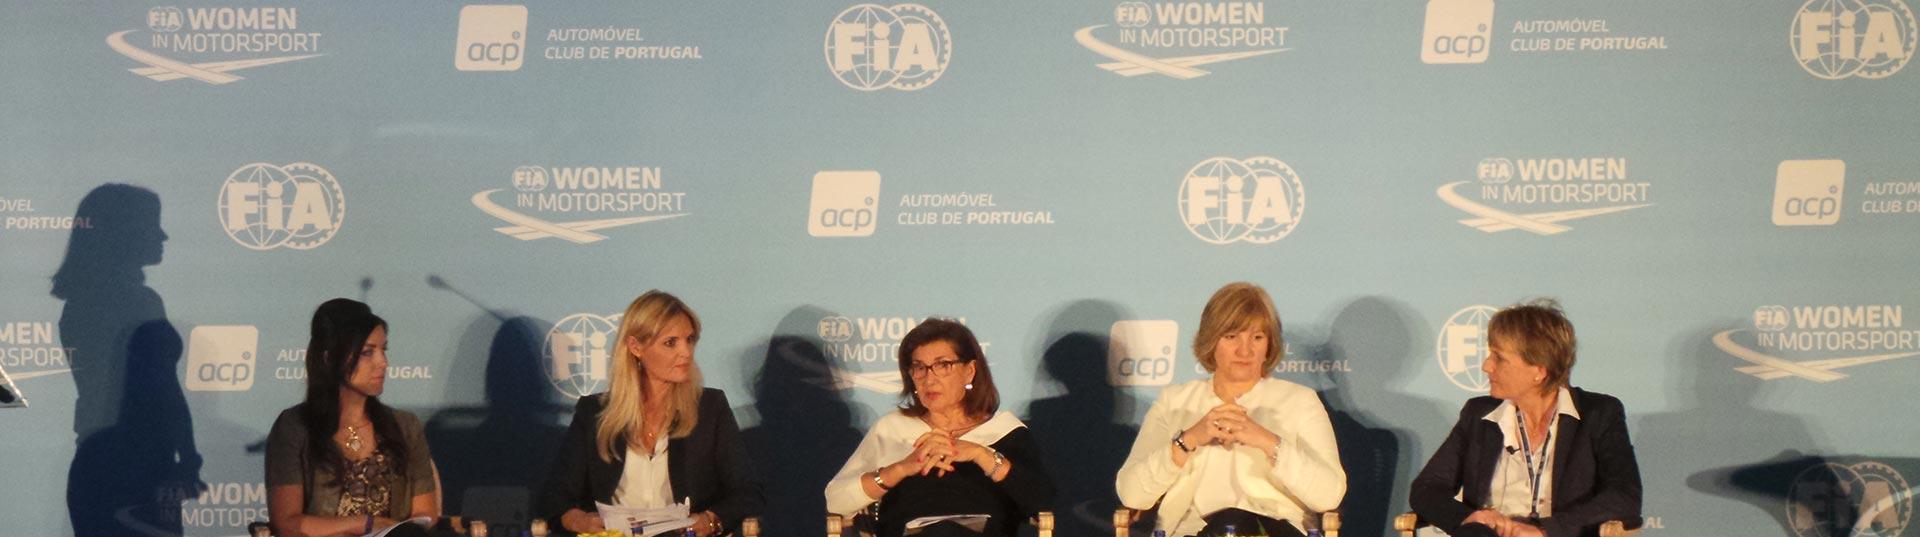 Seminário FIA Women in Motorsport